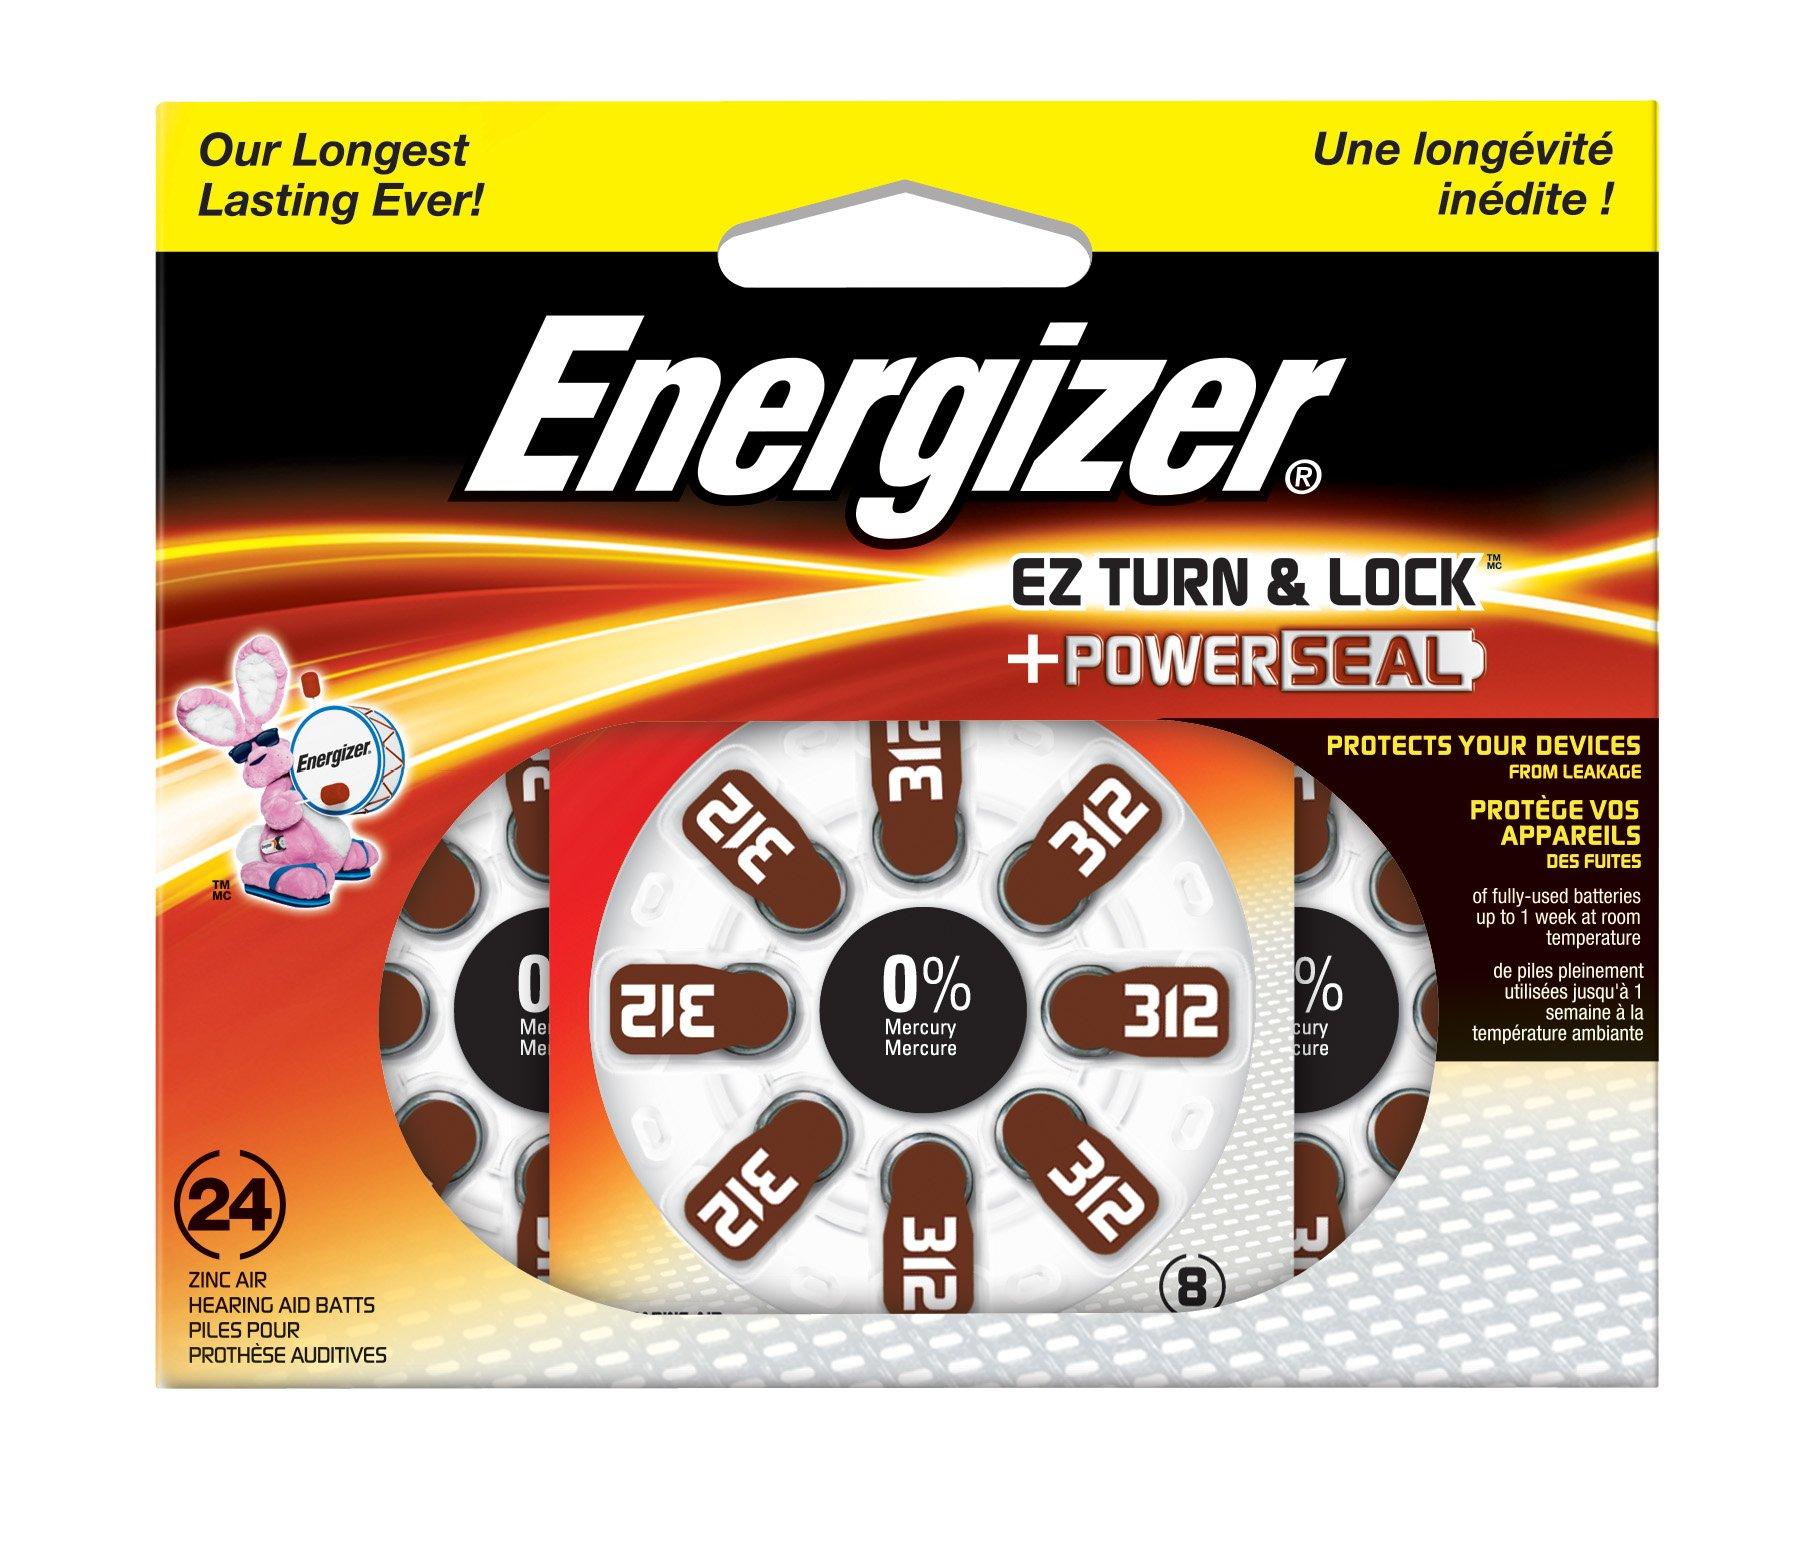 Energizer AZ312DP-24 EZ Turn & Lock Size 312 Hearing Aid Batteries, 24-Count